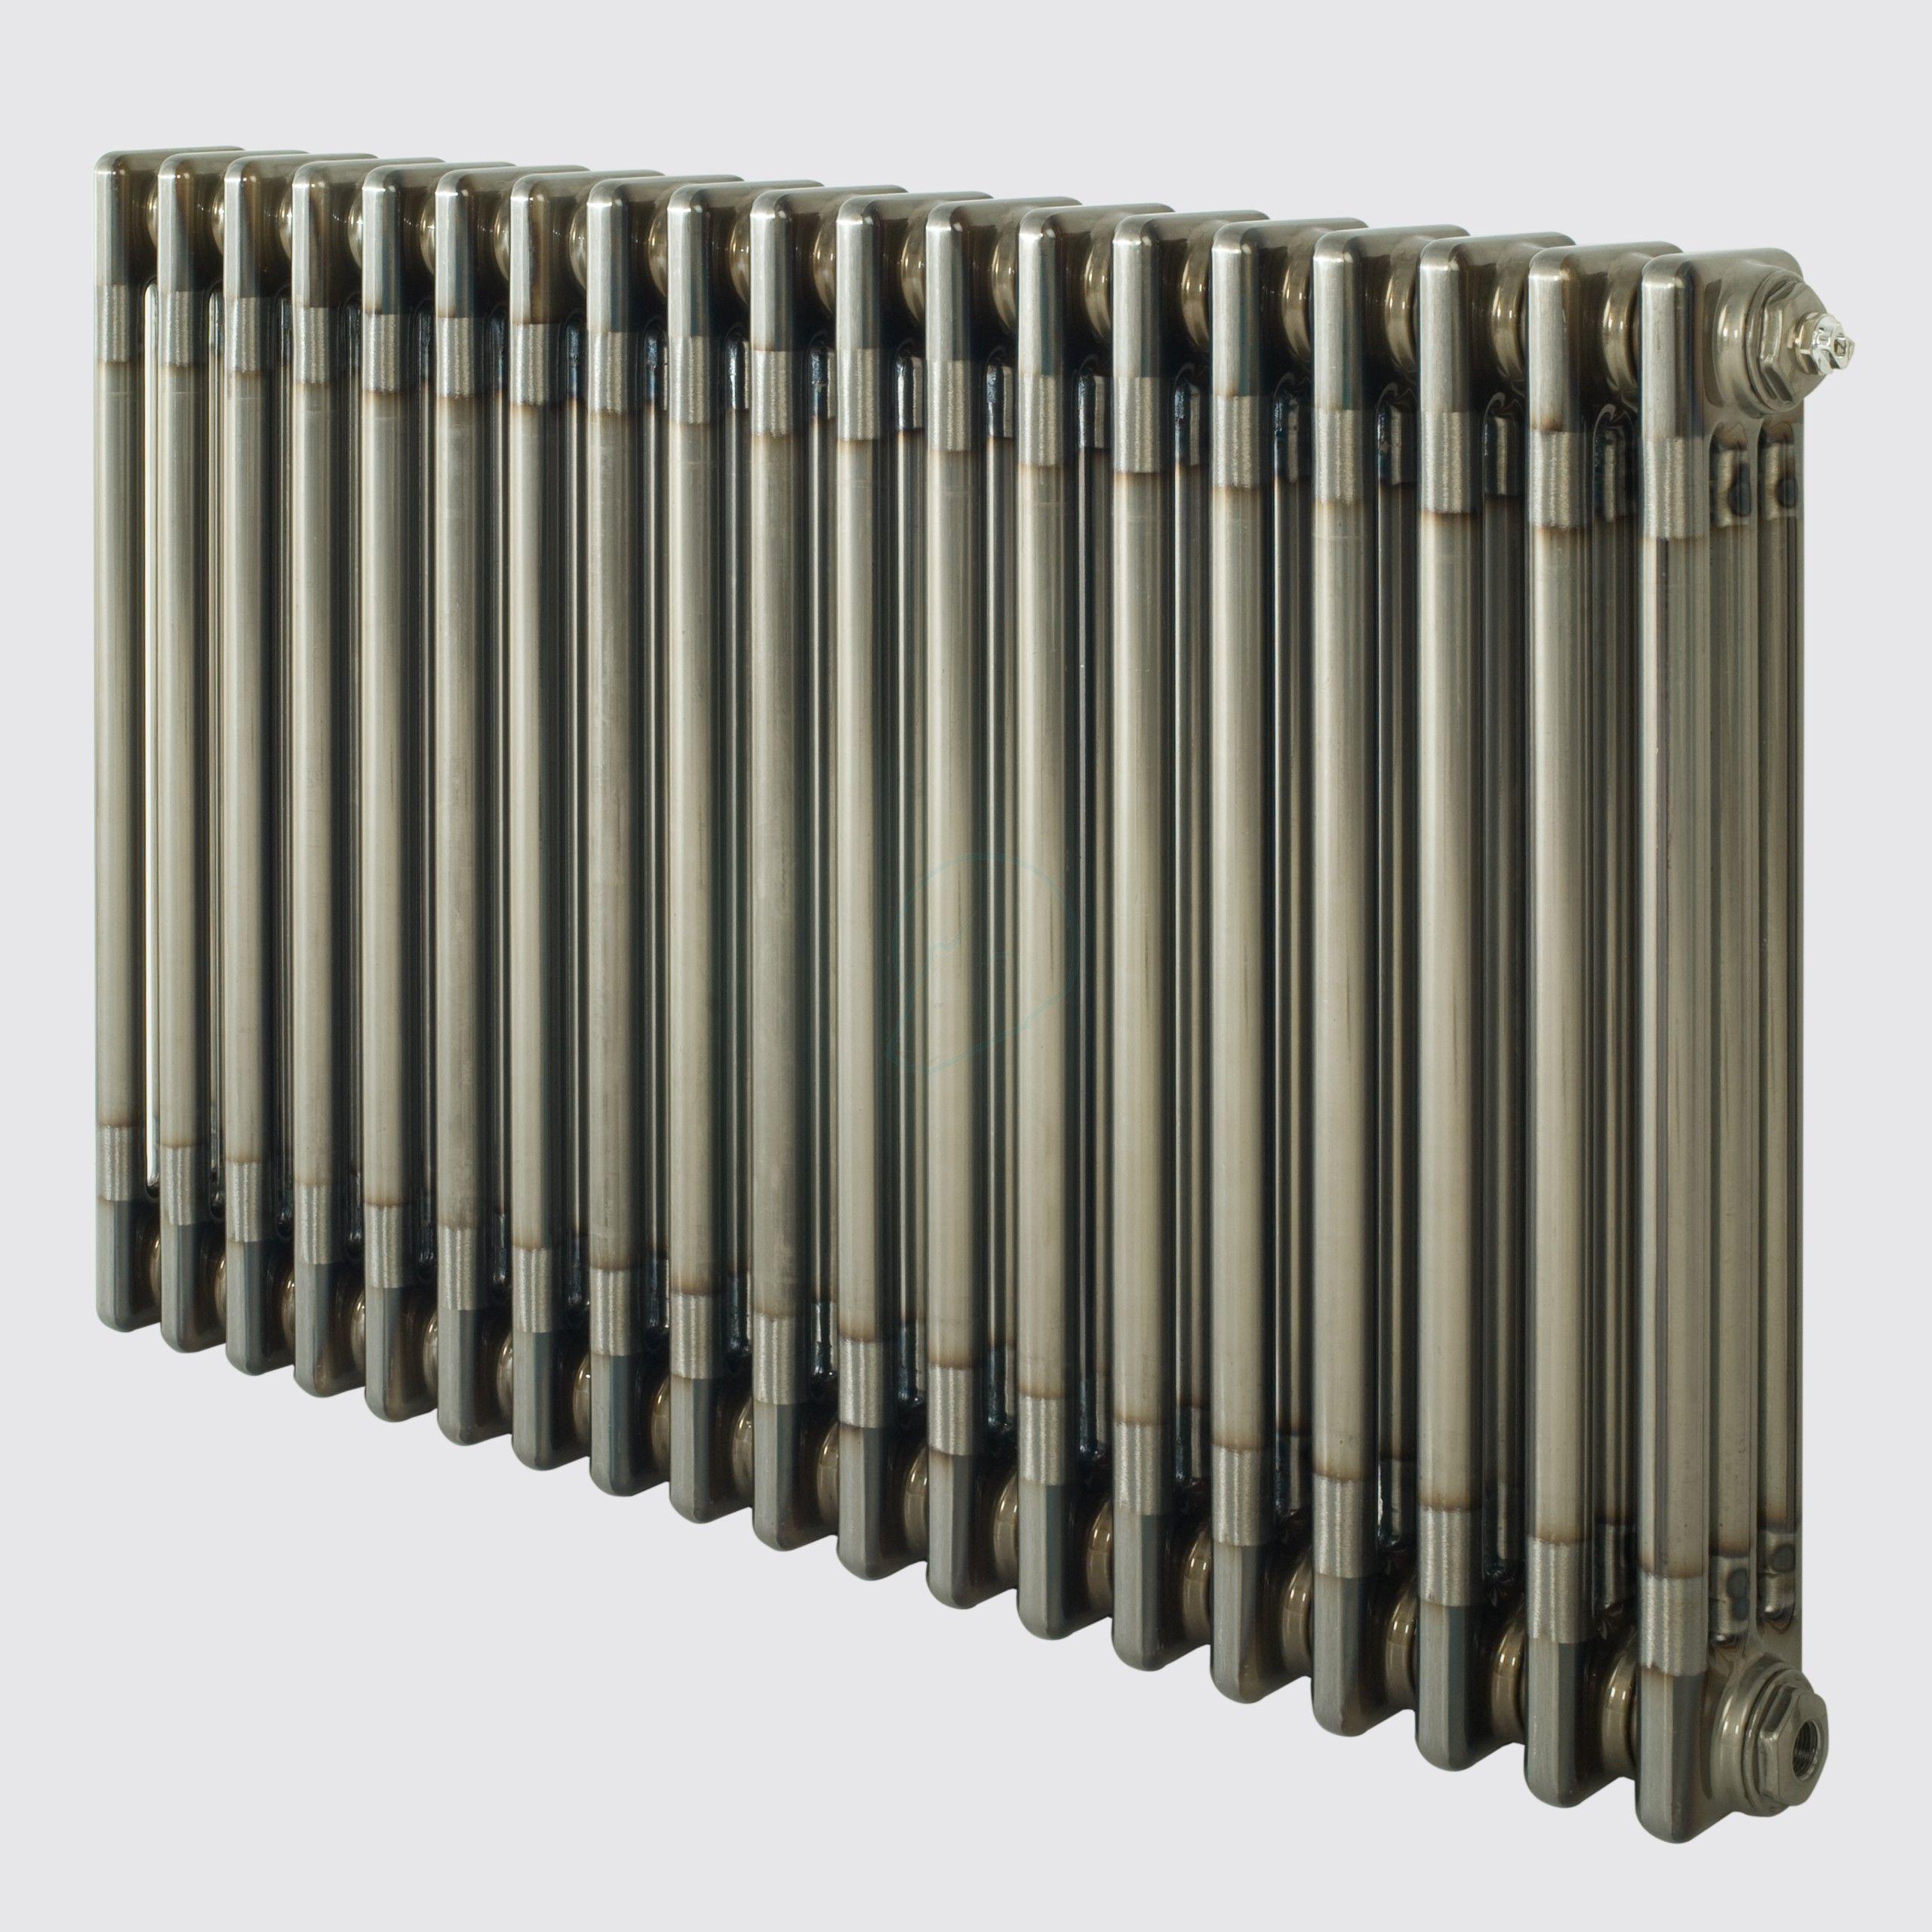 600H x 1180W 3 Column Horizontal Raw Metal Lacquered Radiator